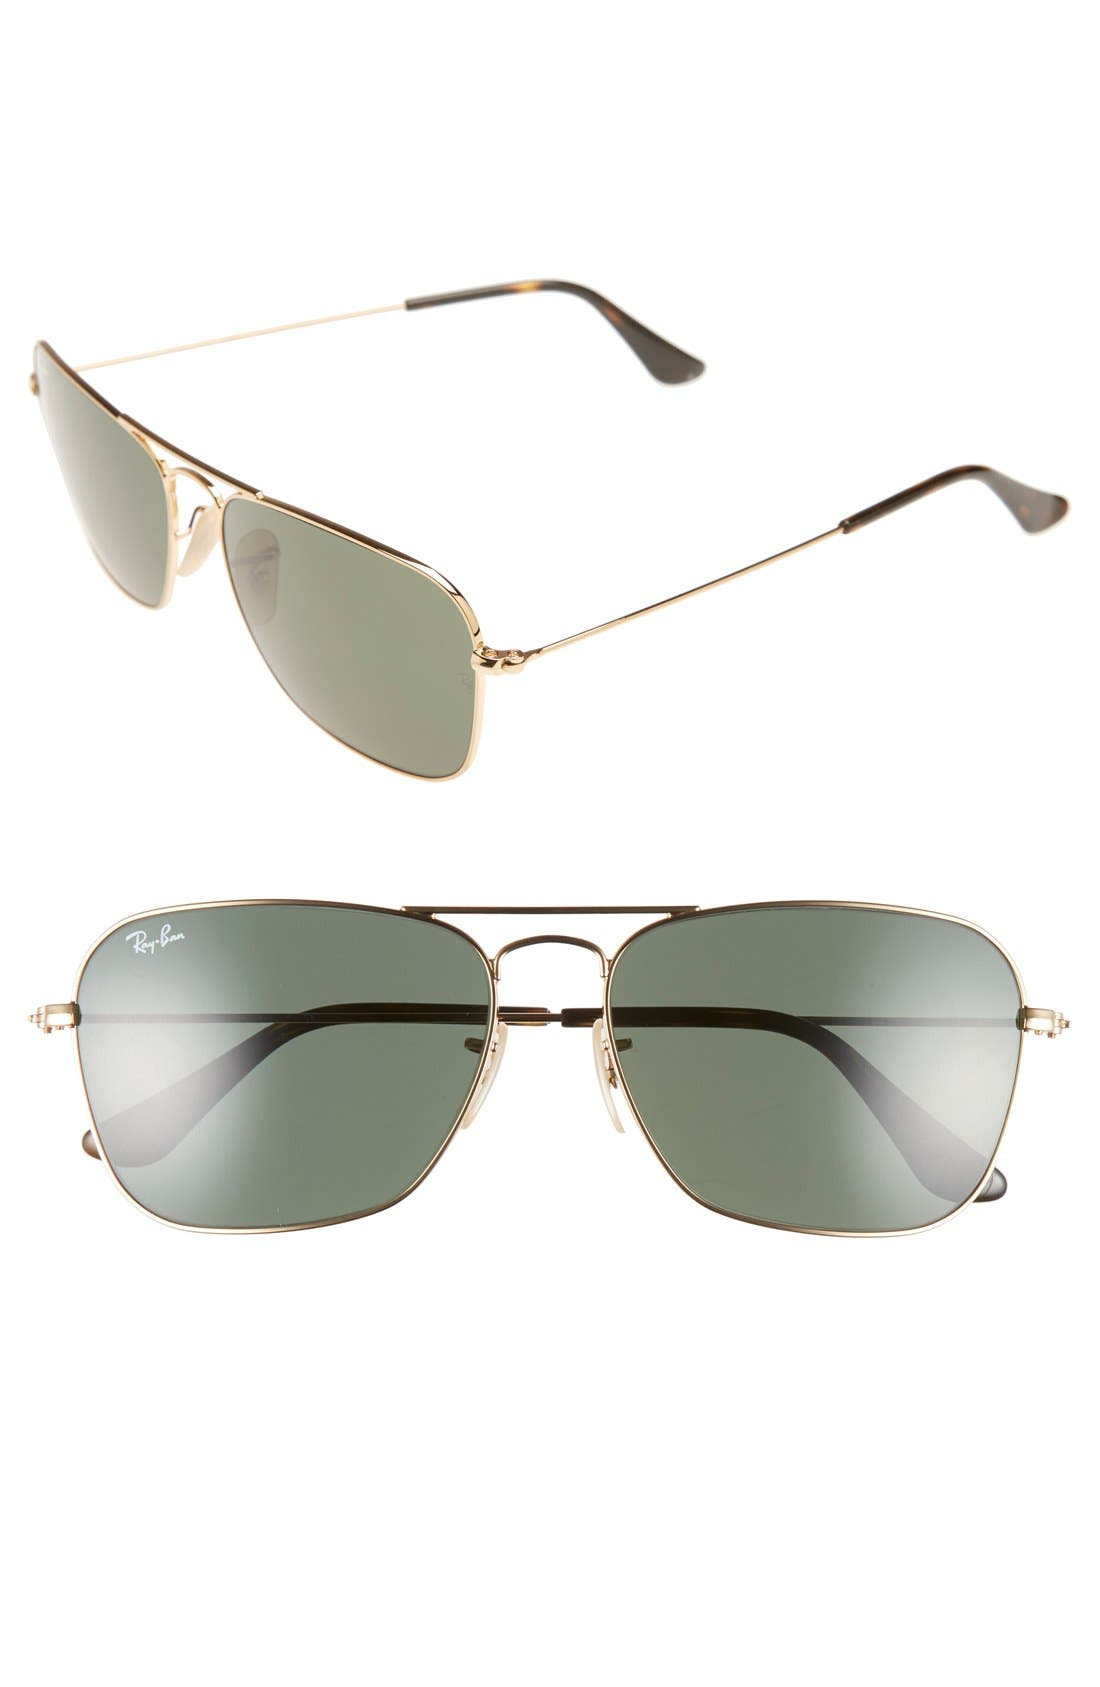 Caravan 58mm Aviator Sunglasses,                             Main thumbnail 1, color,                             GOLD/ DARK GREEN